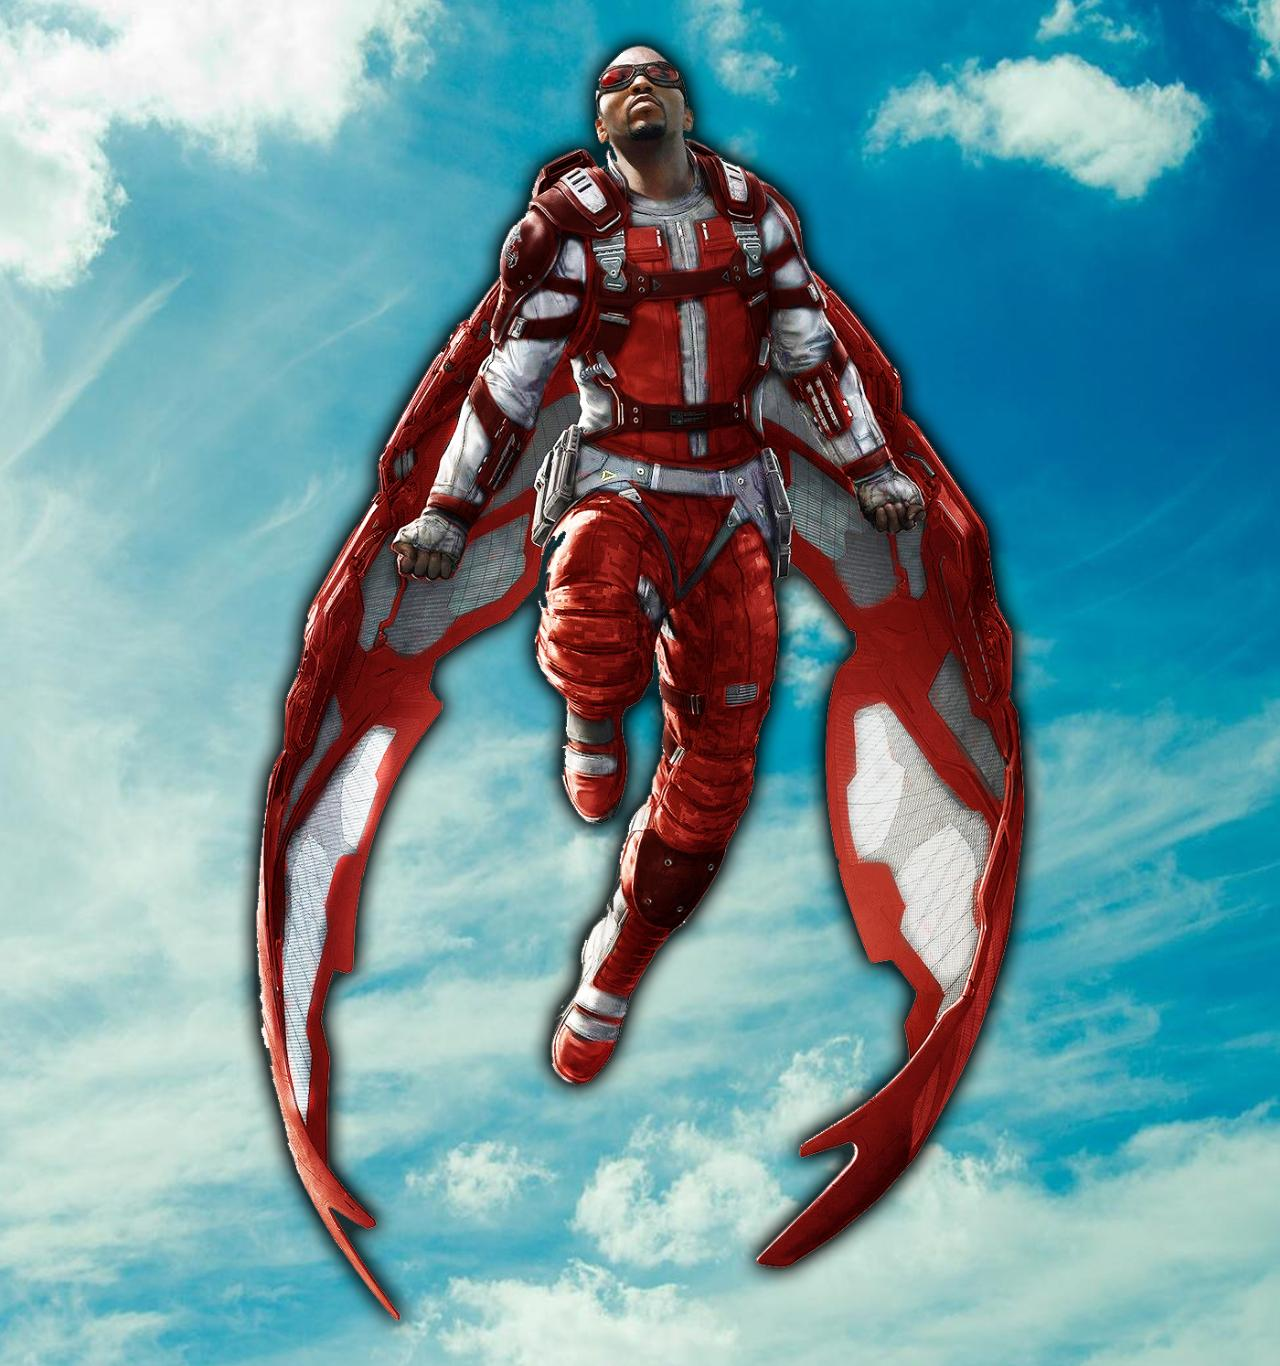 Fantastic Wallpaper Marvel Falcon - latest?cb\u003d20150116032323  Pic_315599.jpg/revision/latest?cb\u003d20150116032323